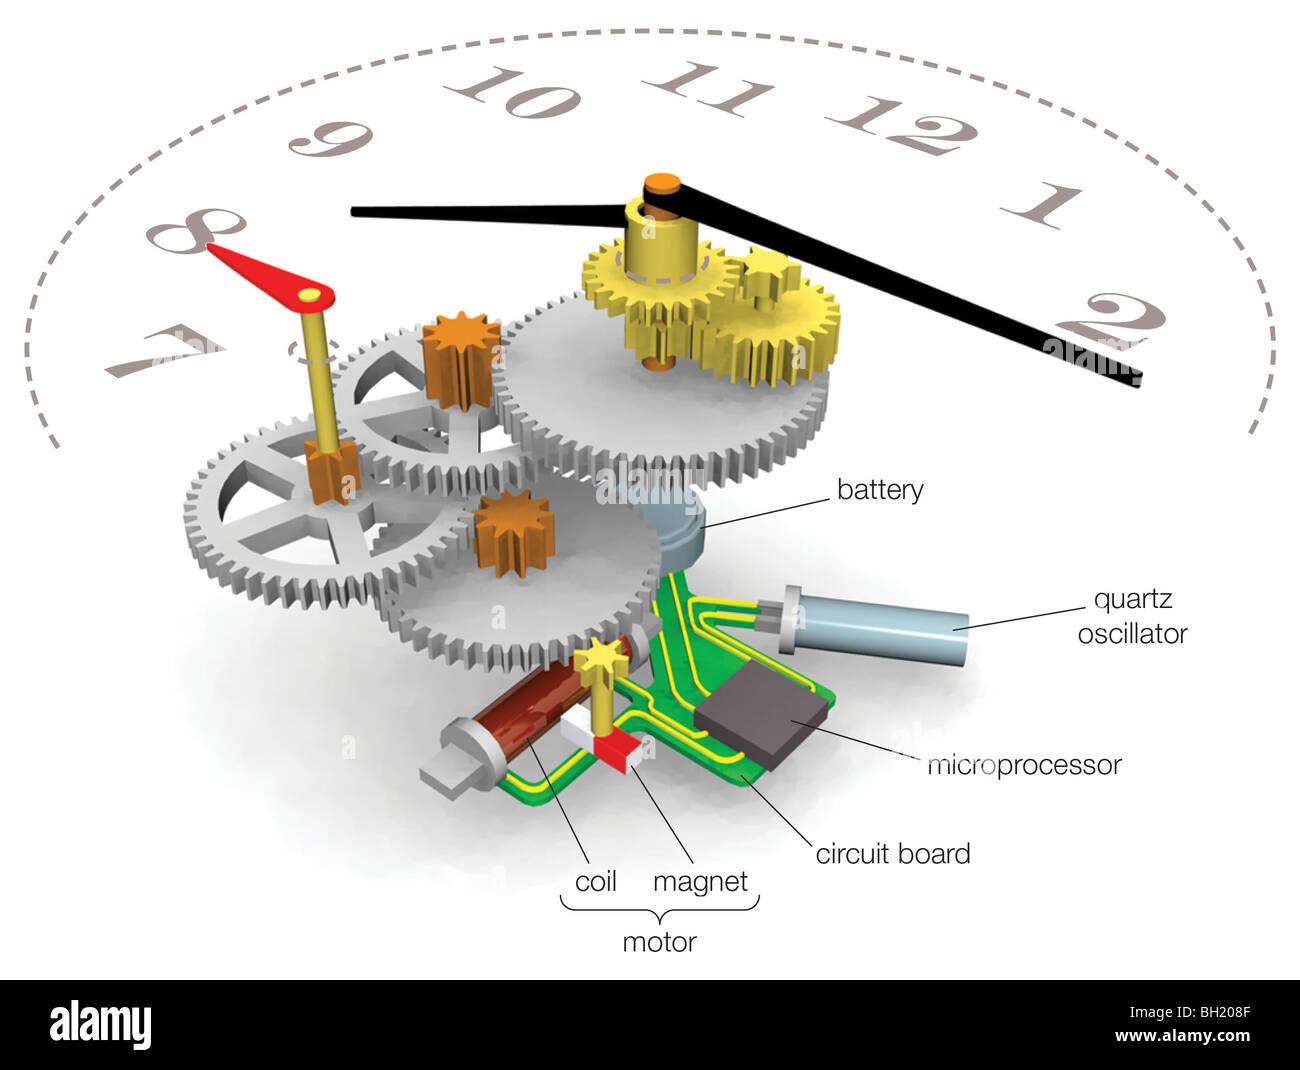 quartz watch - stock image